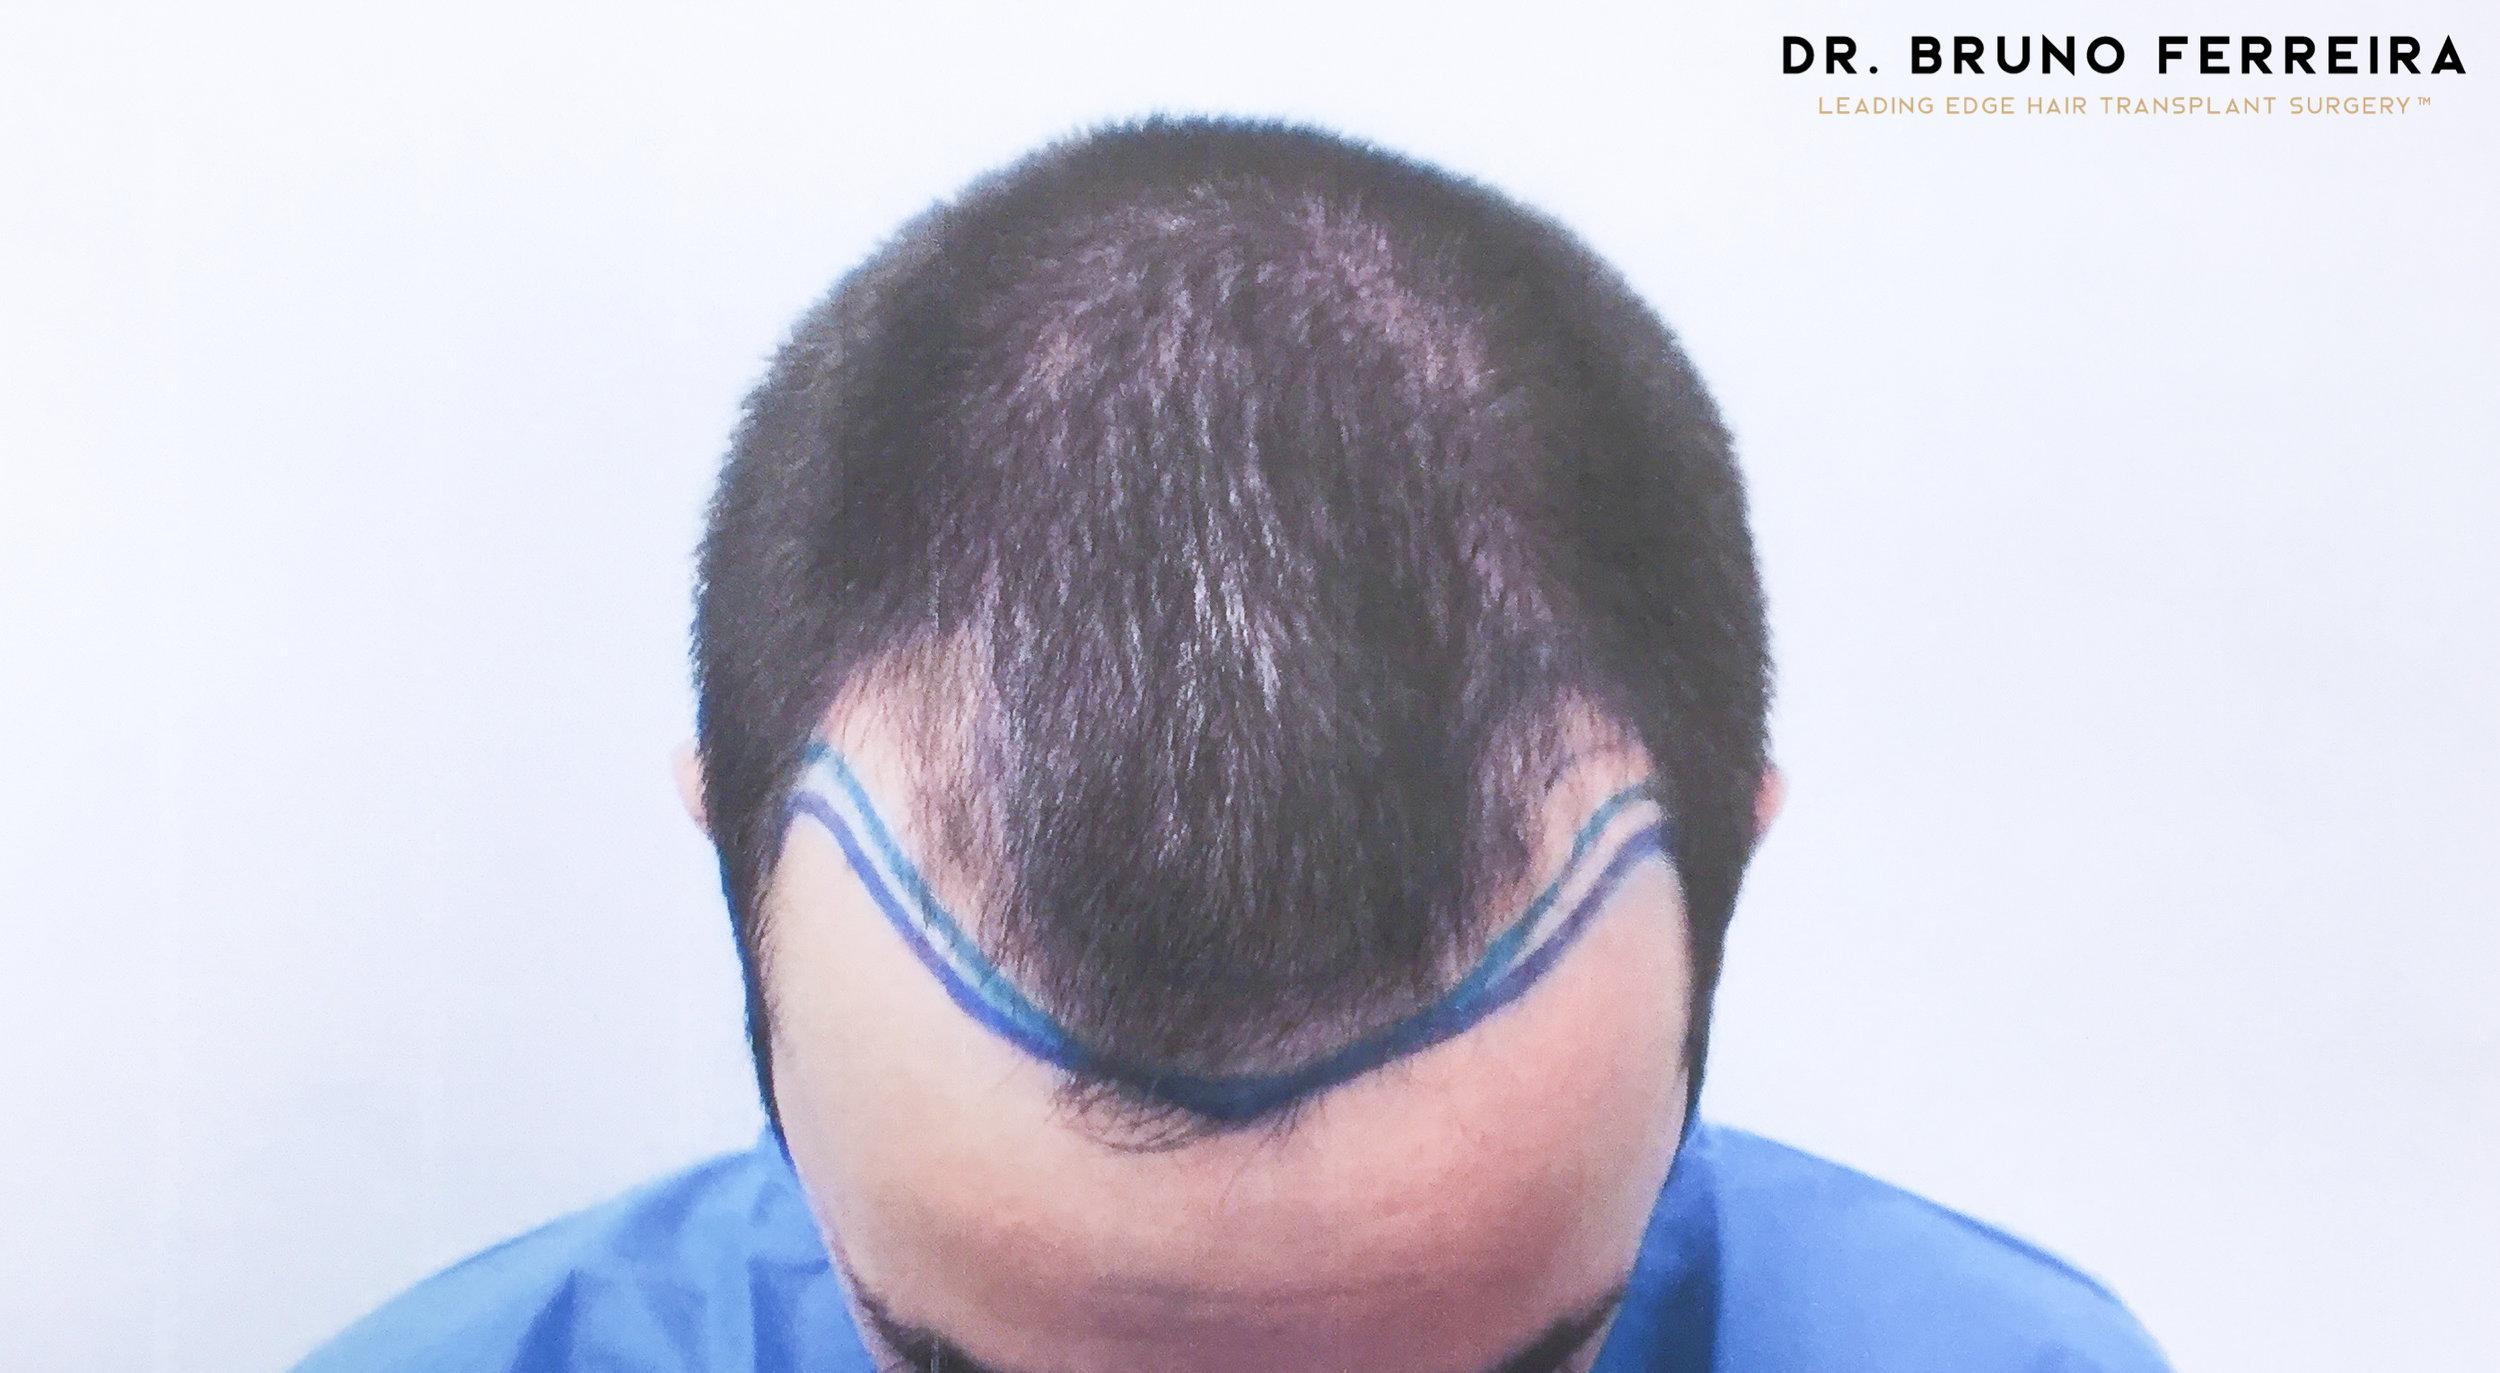 Dr. Bruno Ferreira - Case 4- Before - 1.jpg